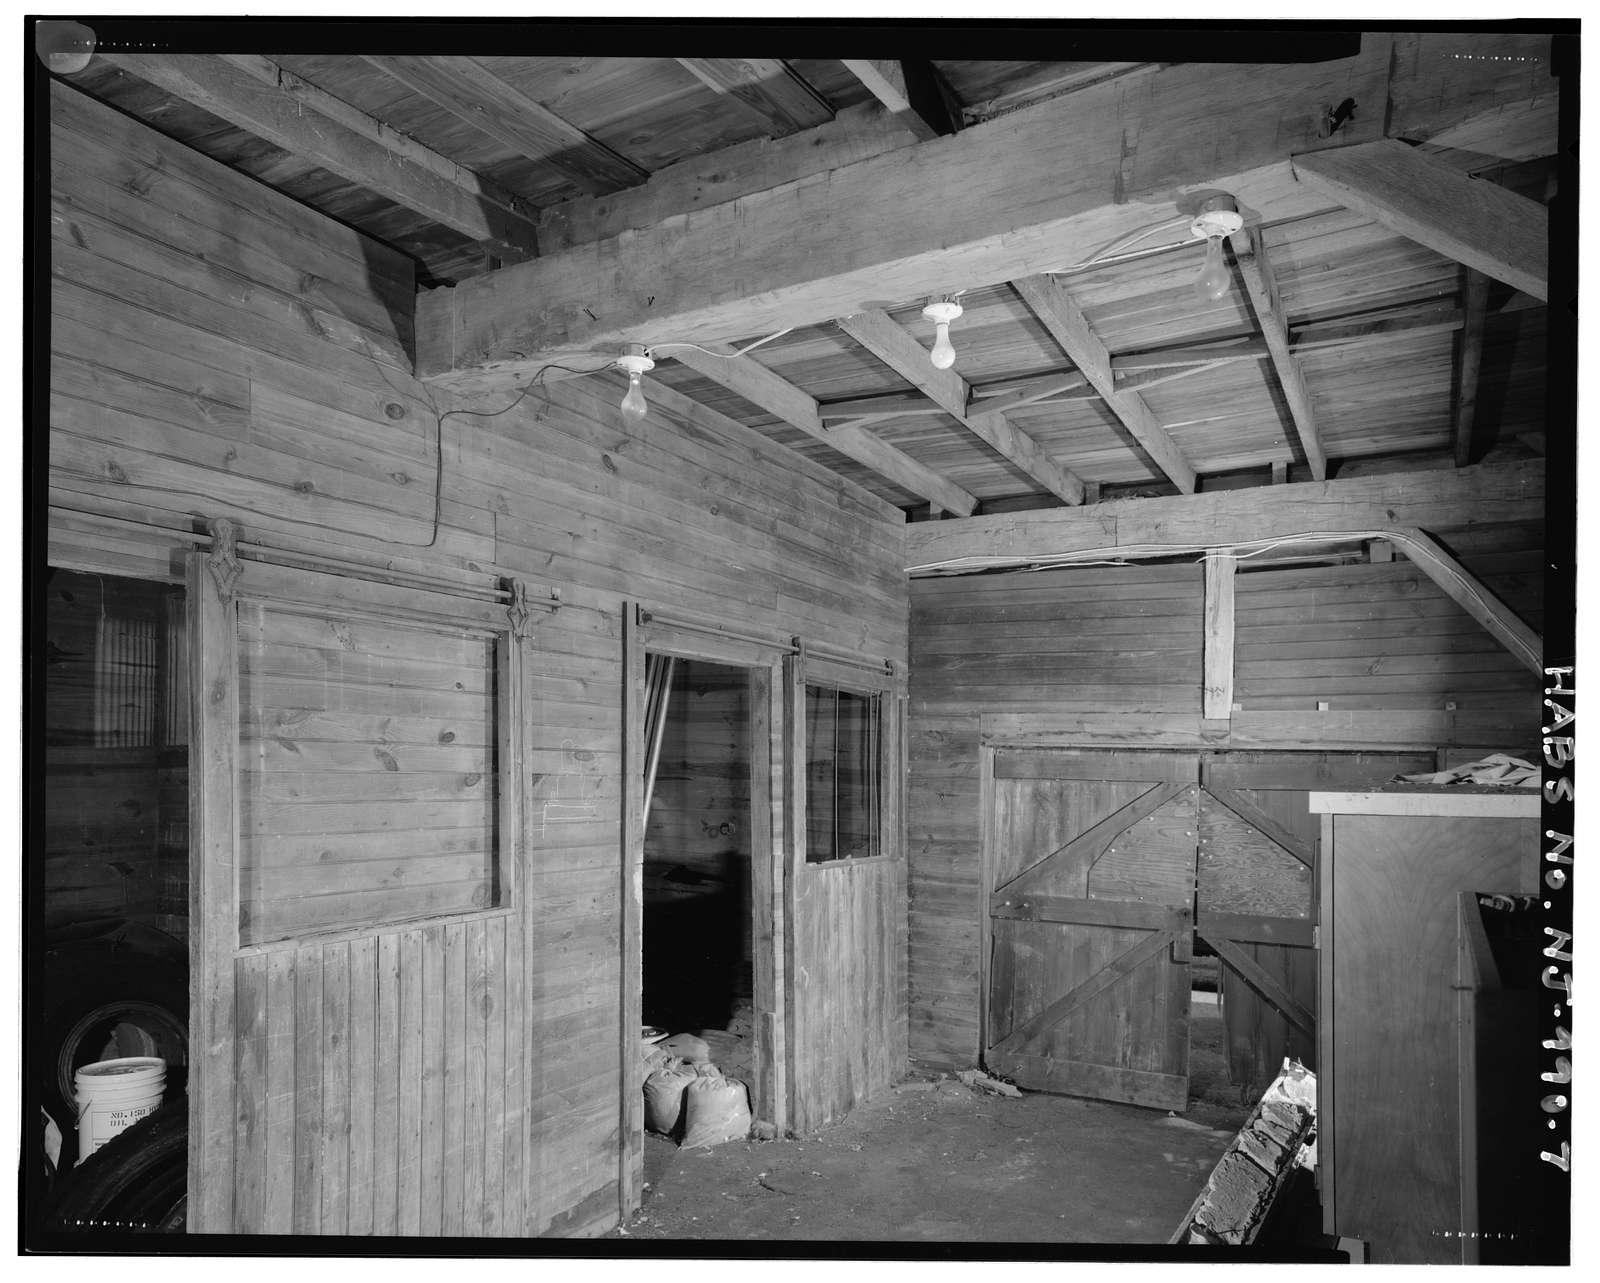 Ackerman-Dewsnap (Bishop) House, Barn, 176 East Saddle River Road, Saddle River, Bergen County, NJ